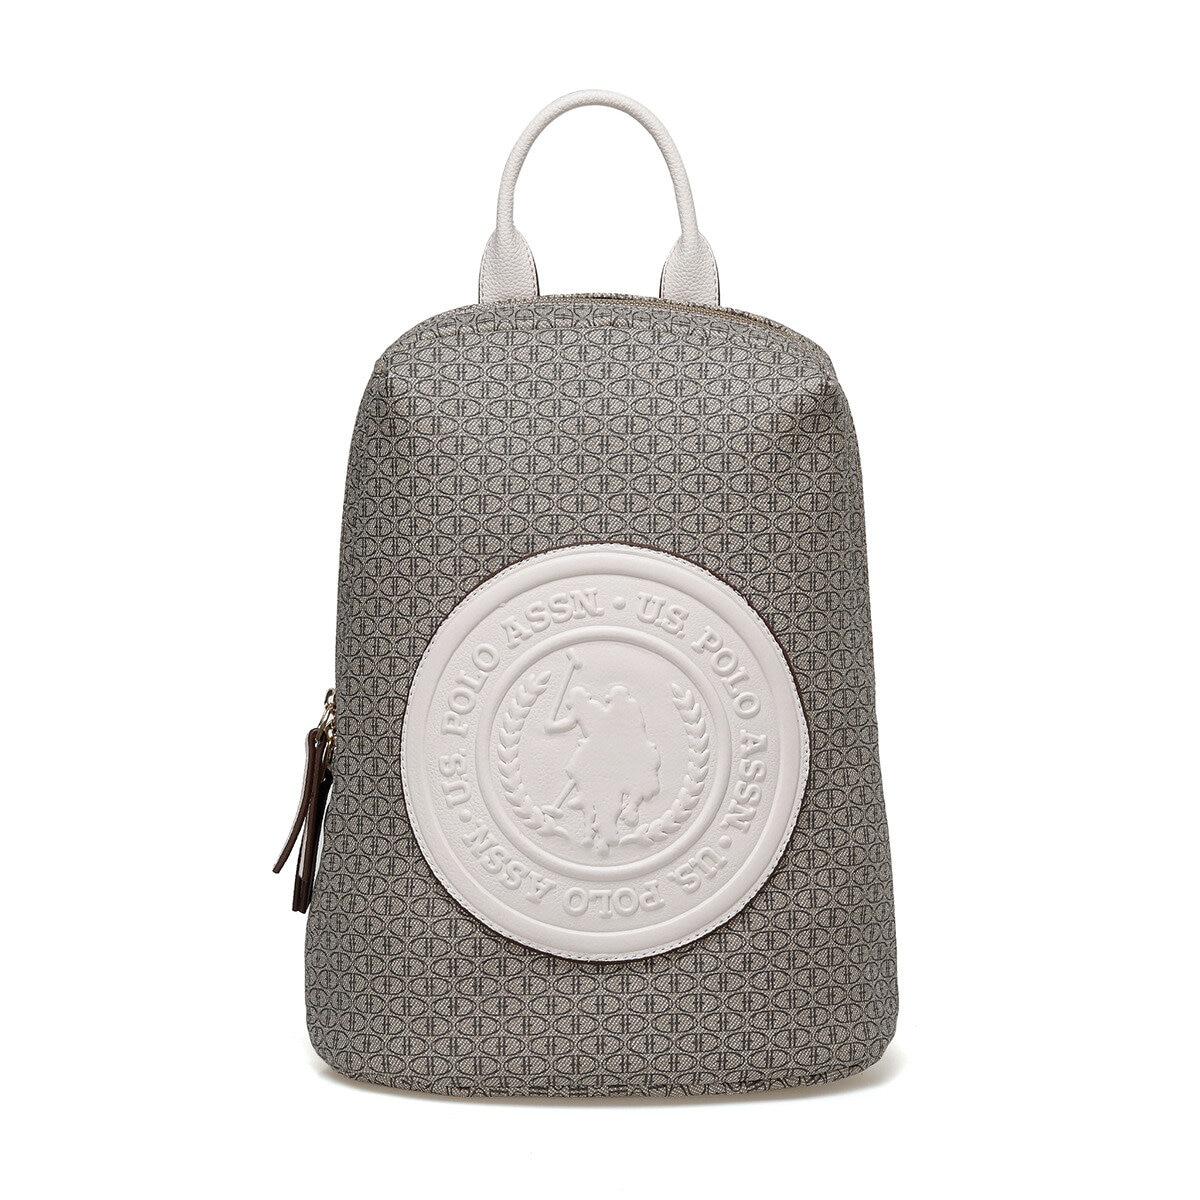 FLO US20221 Mink Women 'S Backpack U.S. POLO ASSN.